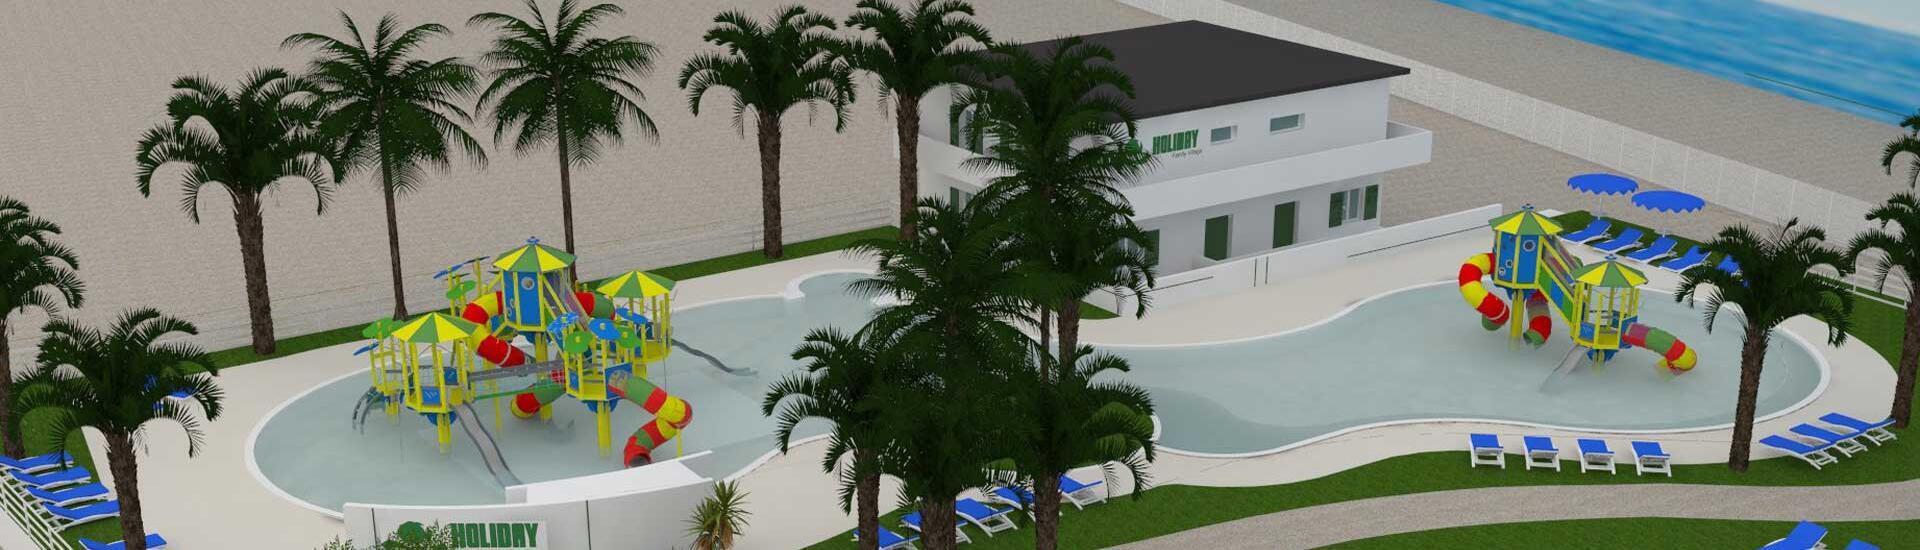 holidayfamilyvillage fr piscines 012